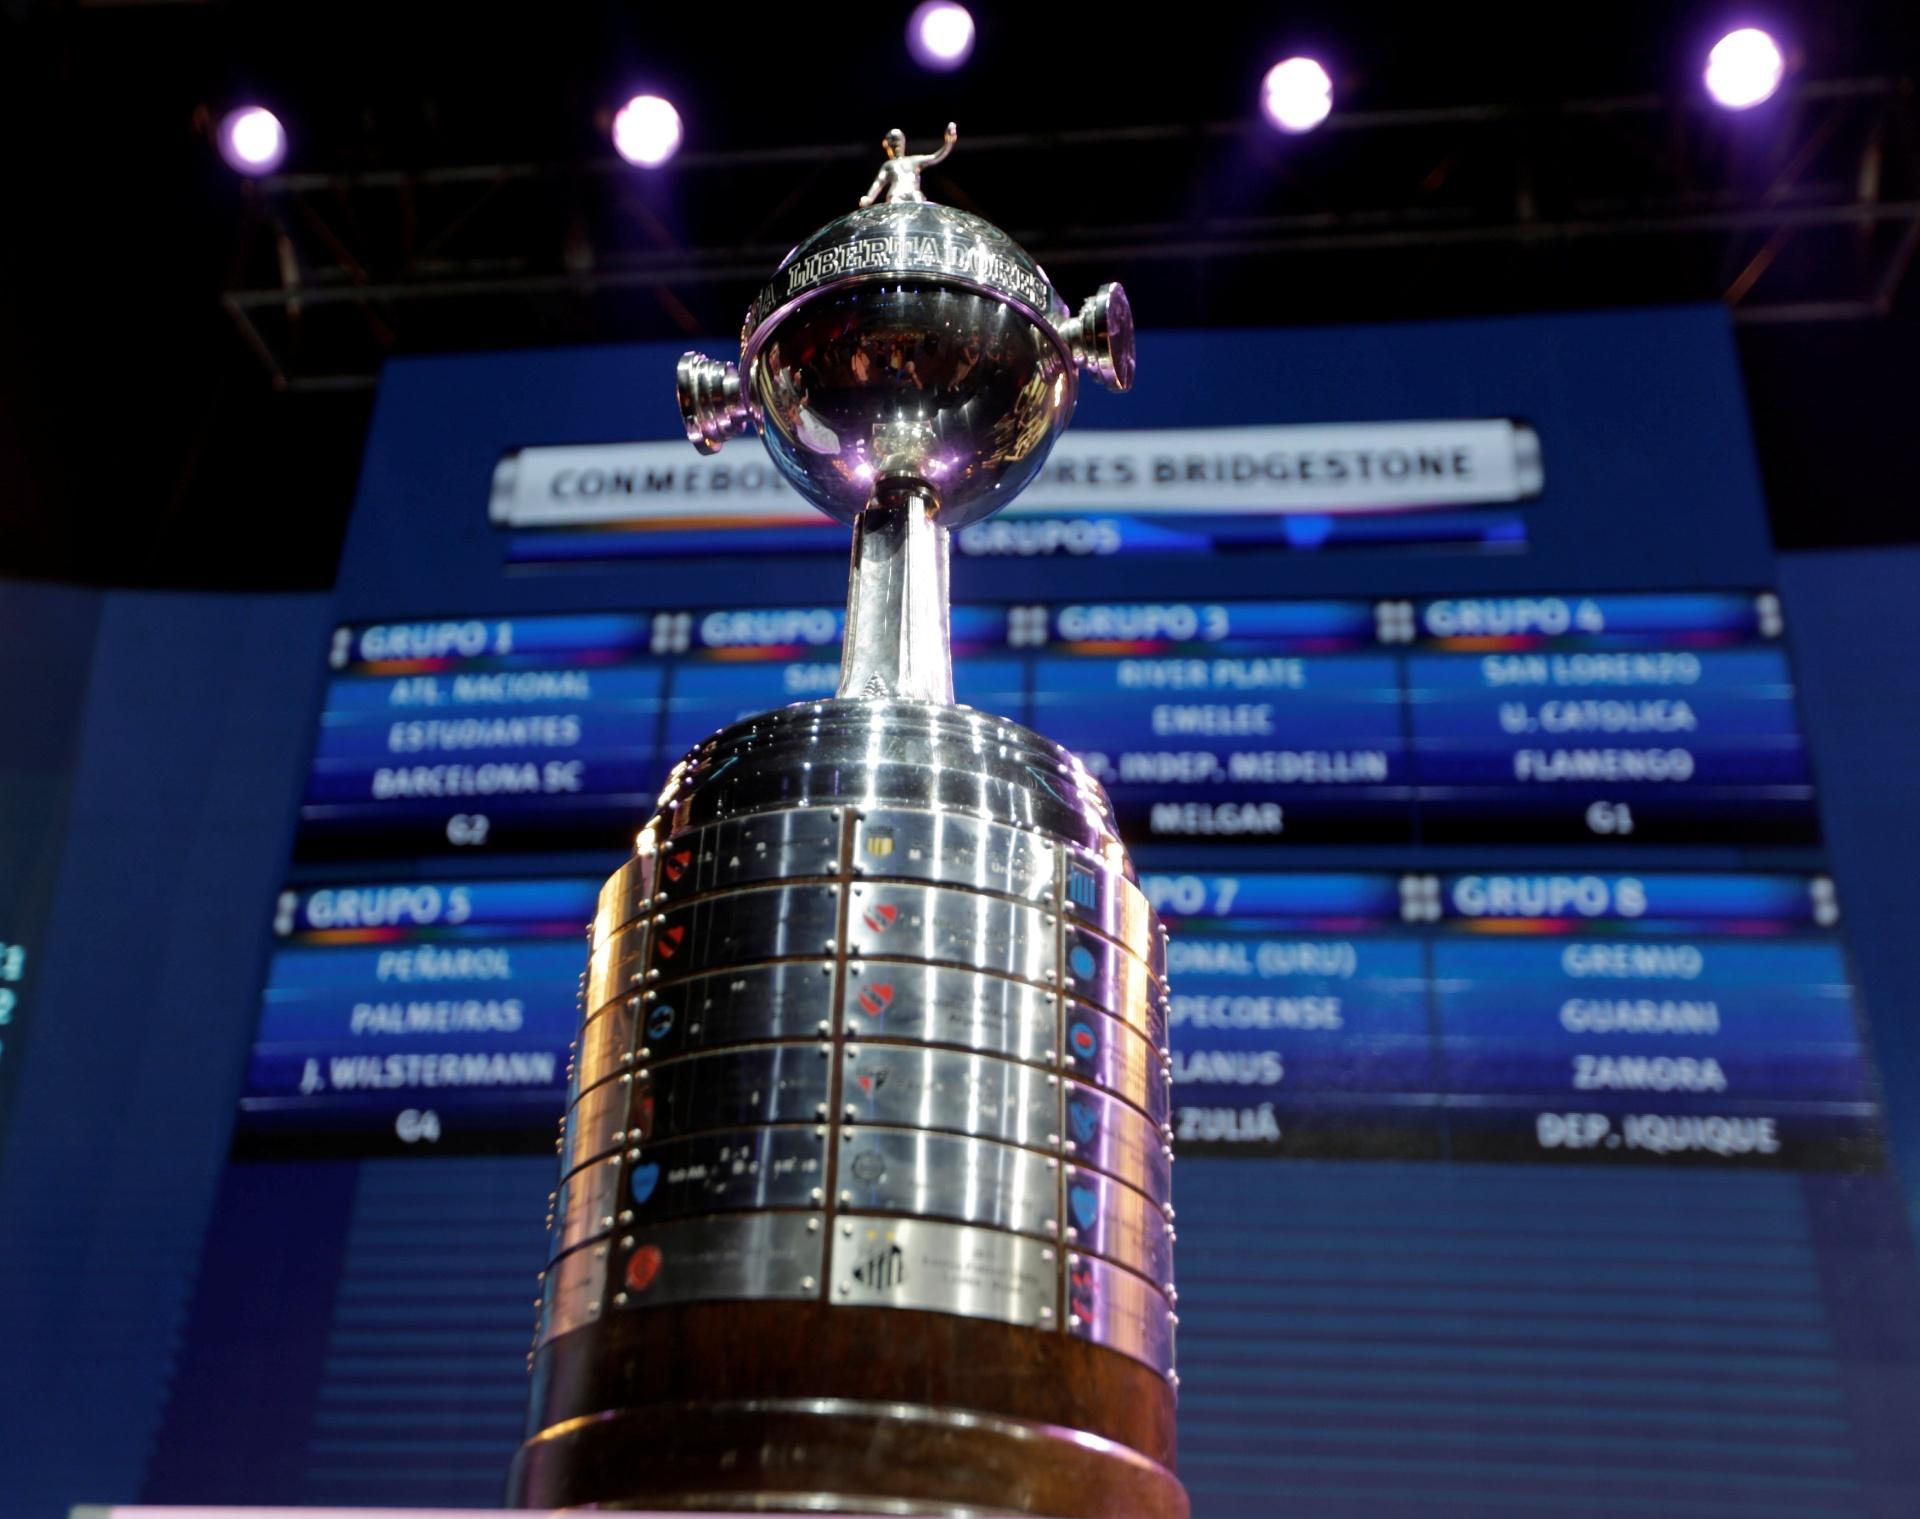 Libertadores terá ao menos 12 duelos entre campeões já na fase de grupos -  21 12 2017 - UOL Esporte ea5227a2016fd